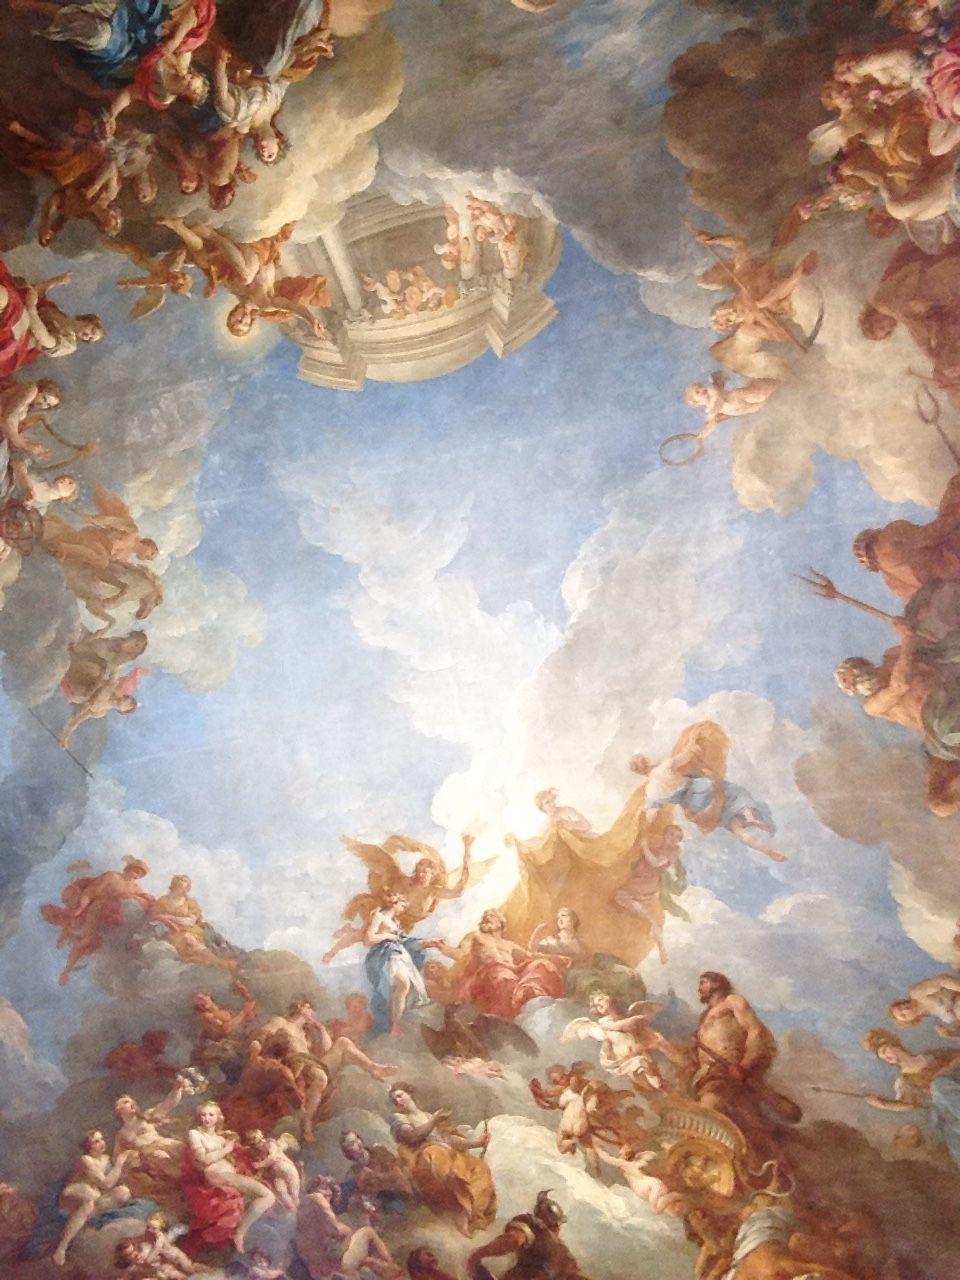 Aesthetic Angel Wallpapers Top Free Aesthetic Angel